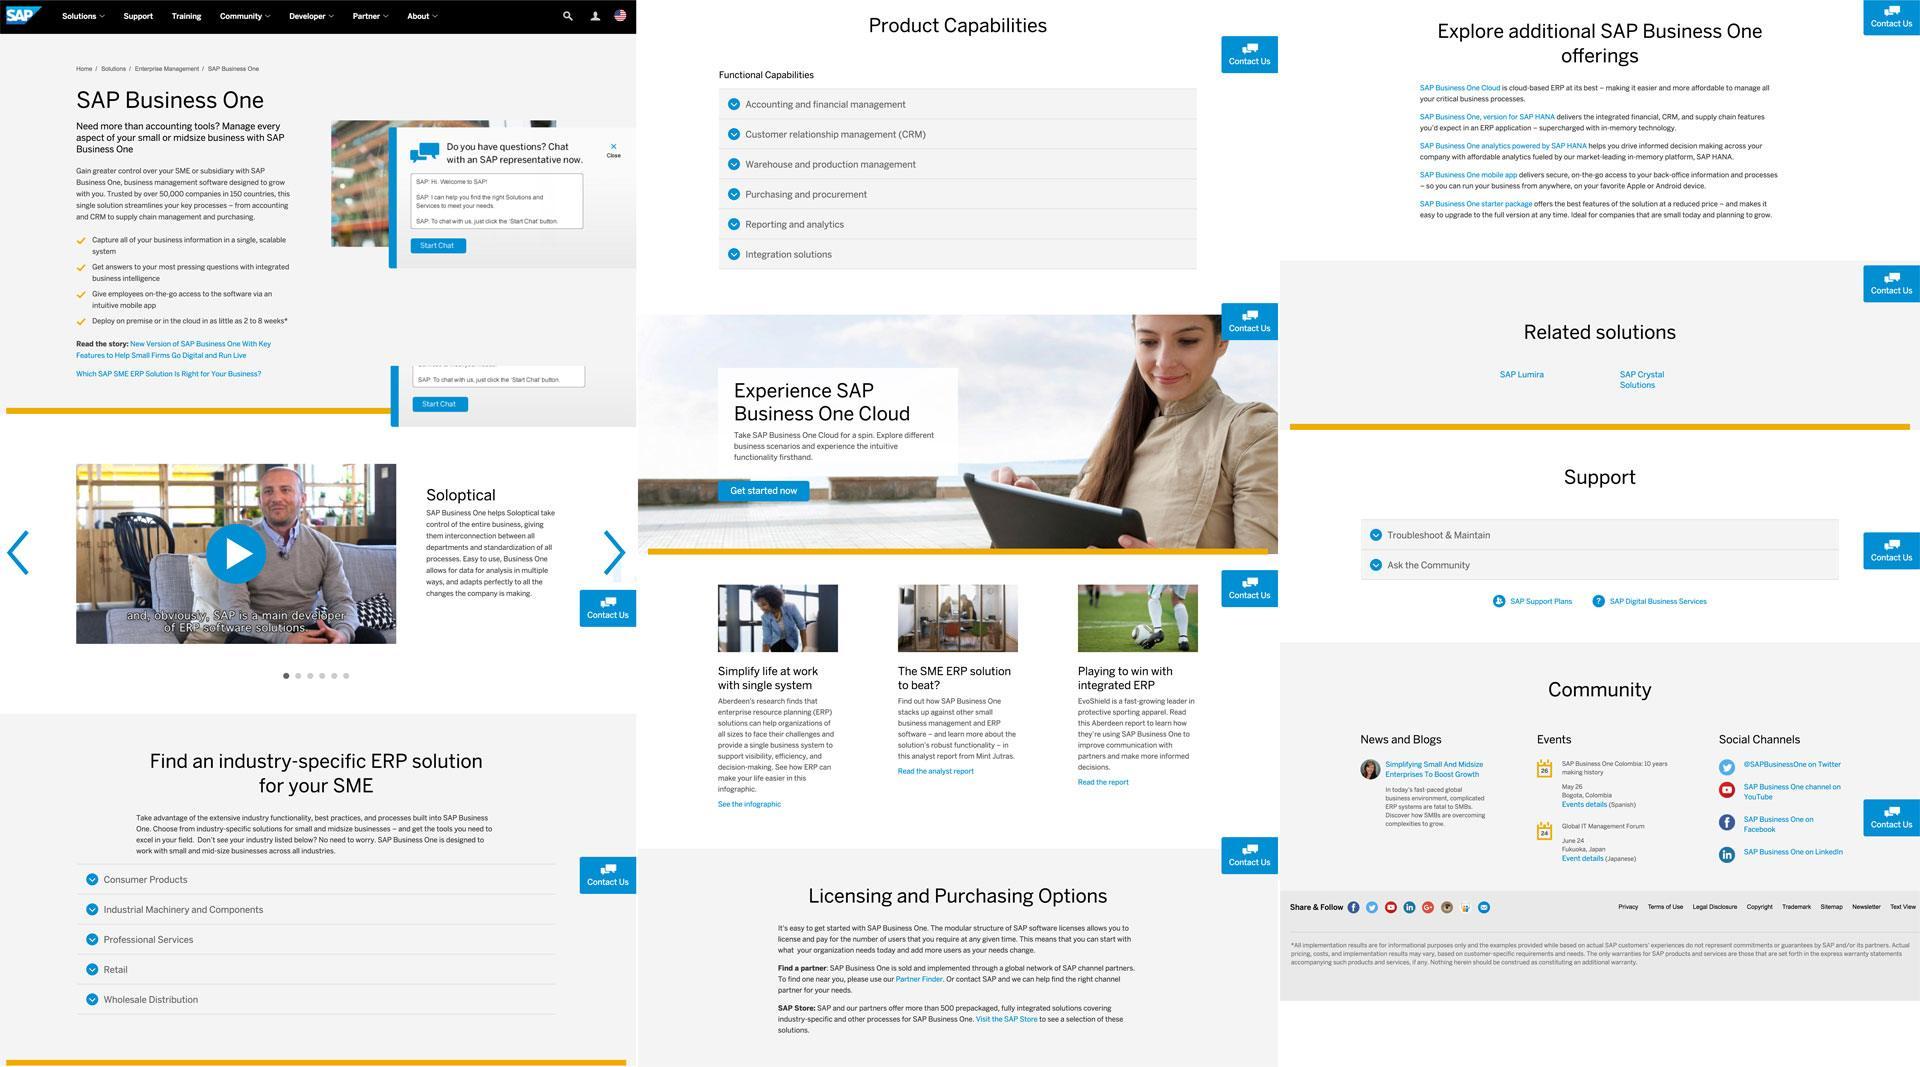 Accounting Software Uses a Long Landing Page | Disruptive Advertising